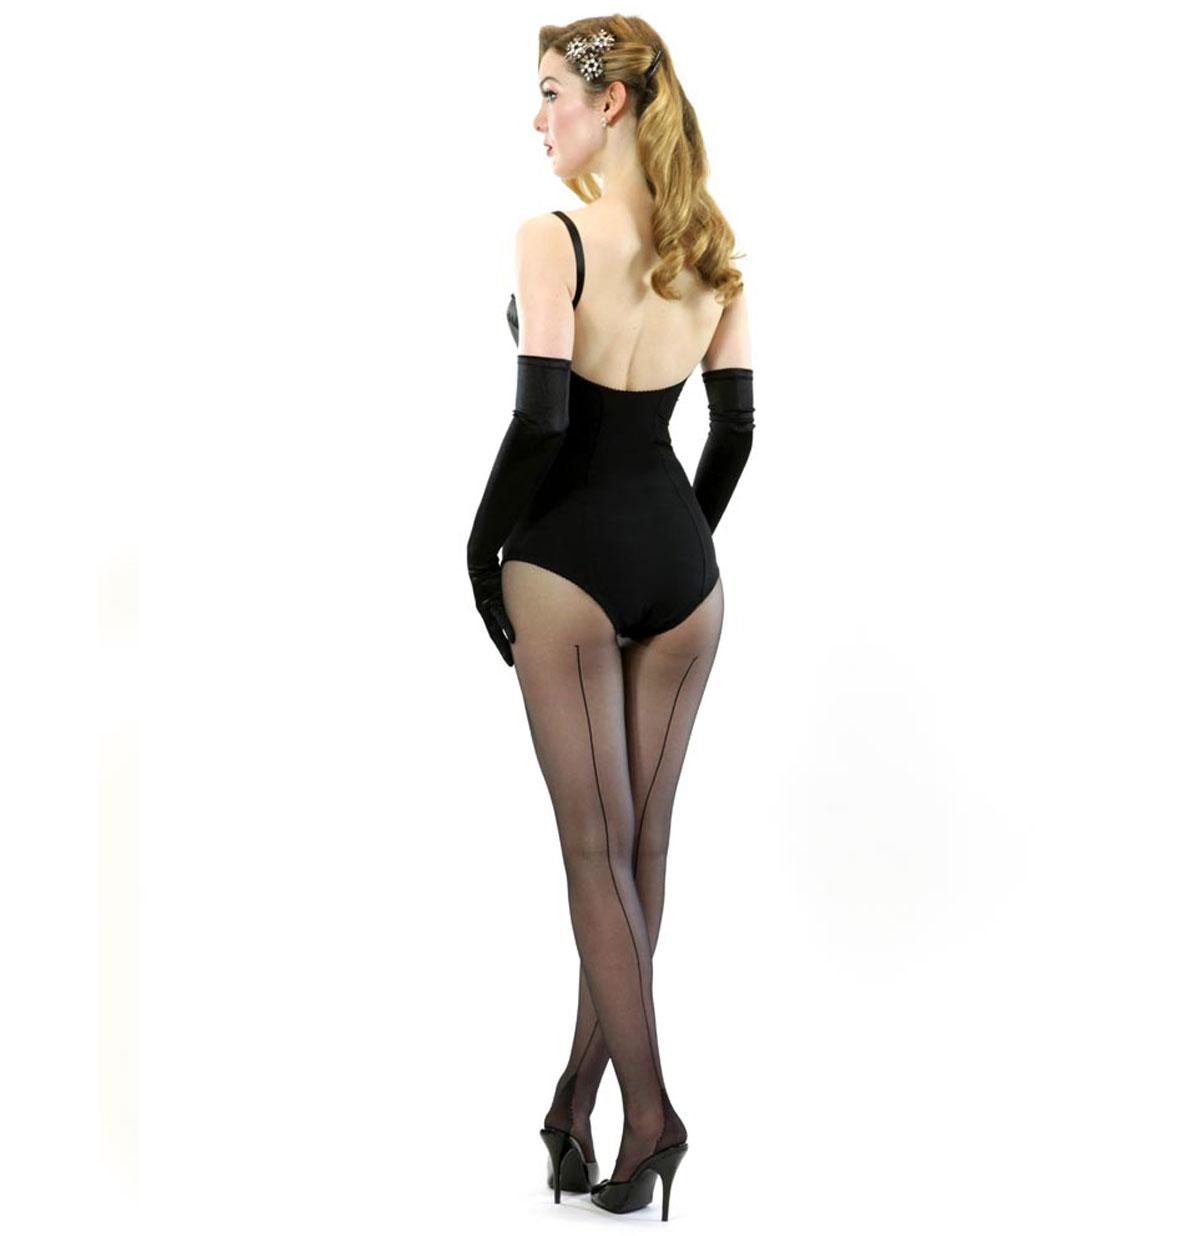 Panty Retro Zwart, zwarte naad